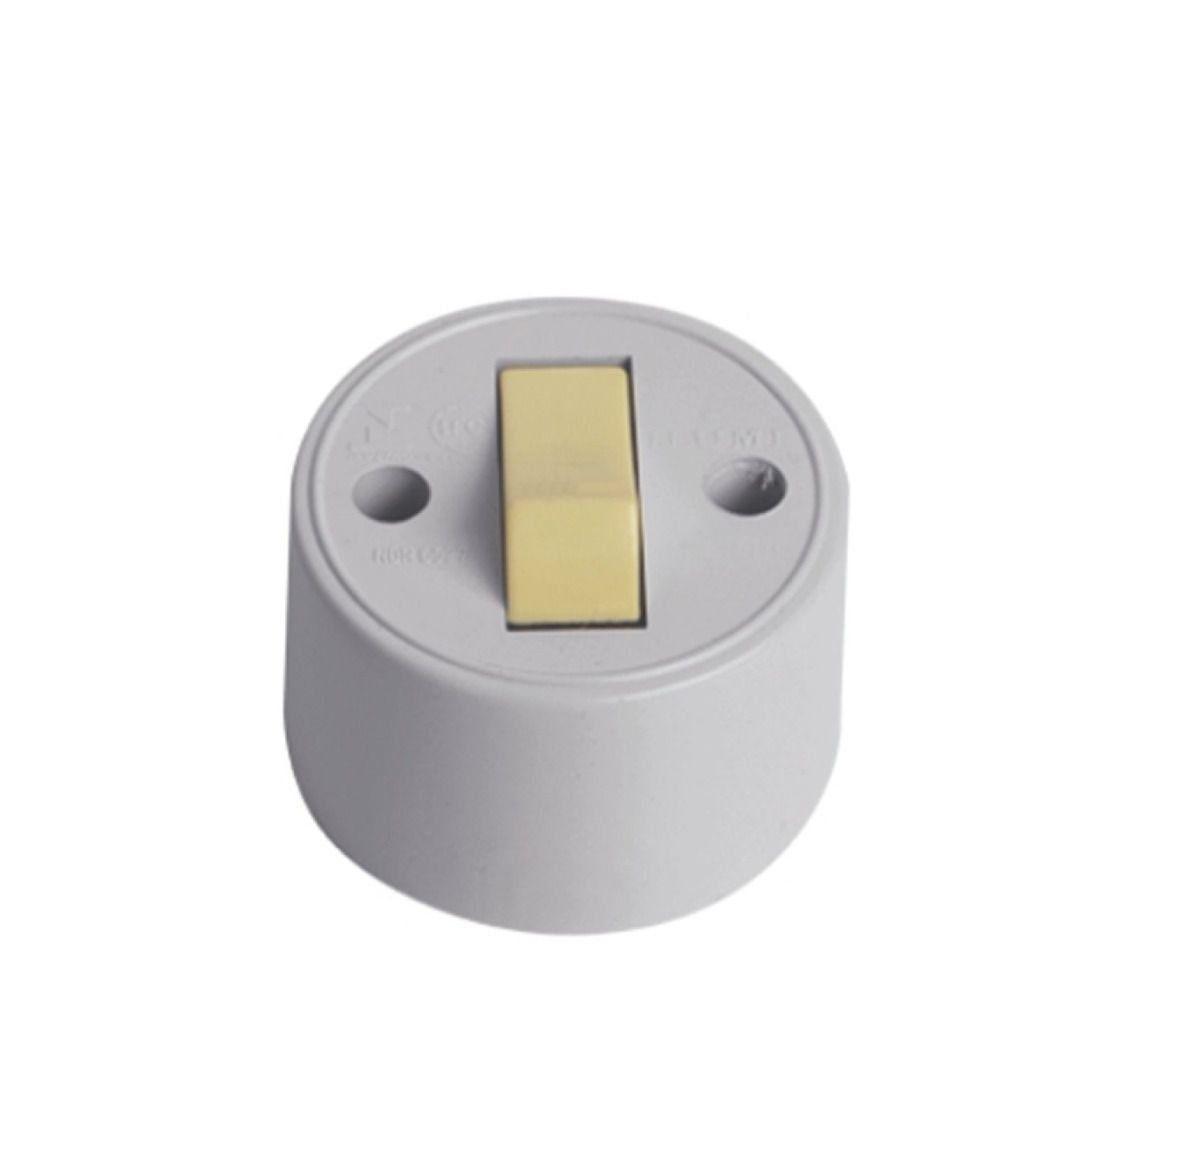 Interruptor Externo Redondo 1755 Ilumi